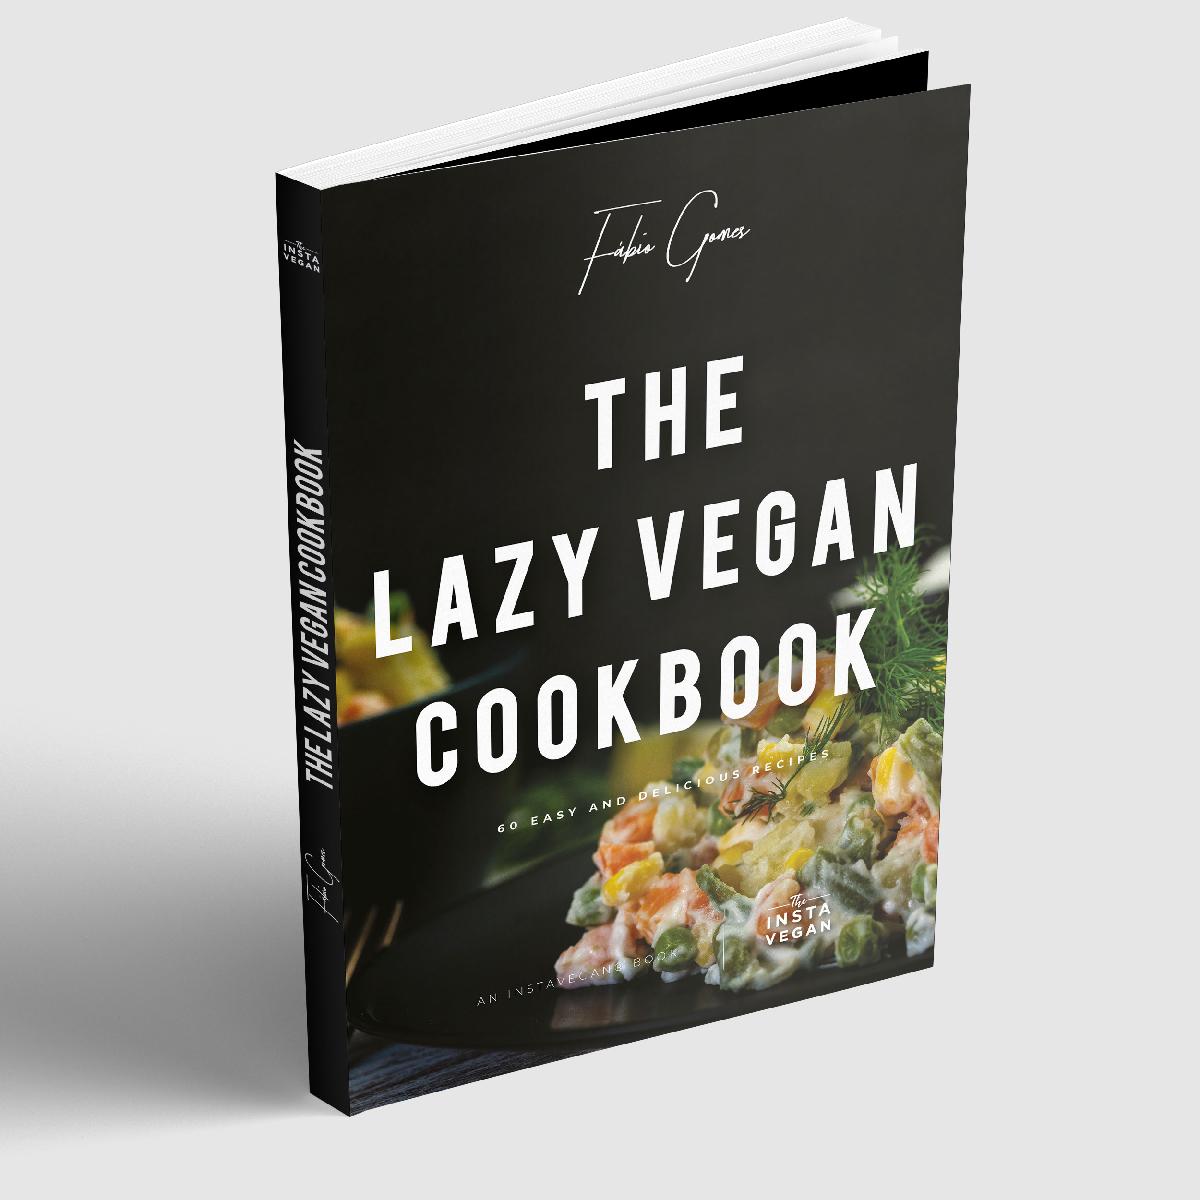 The Lazy Vegan Cookbook